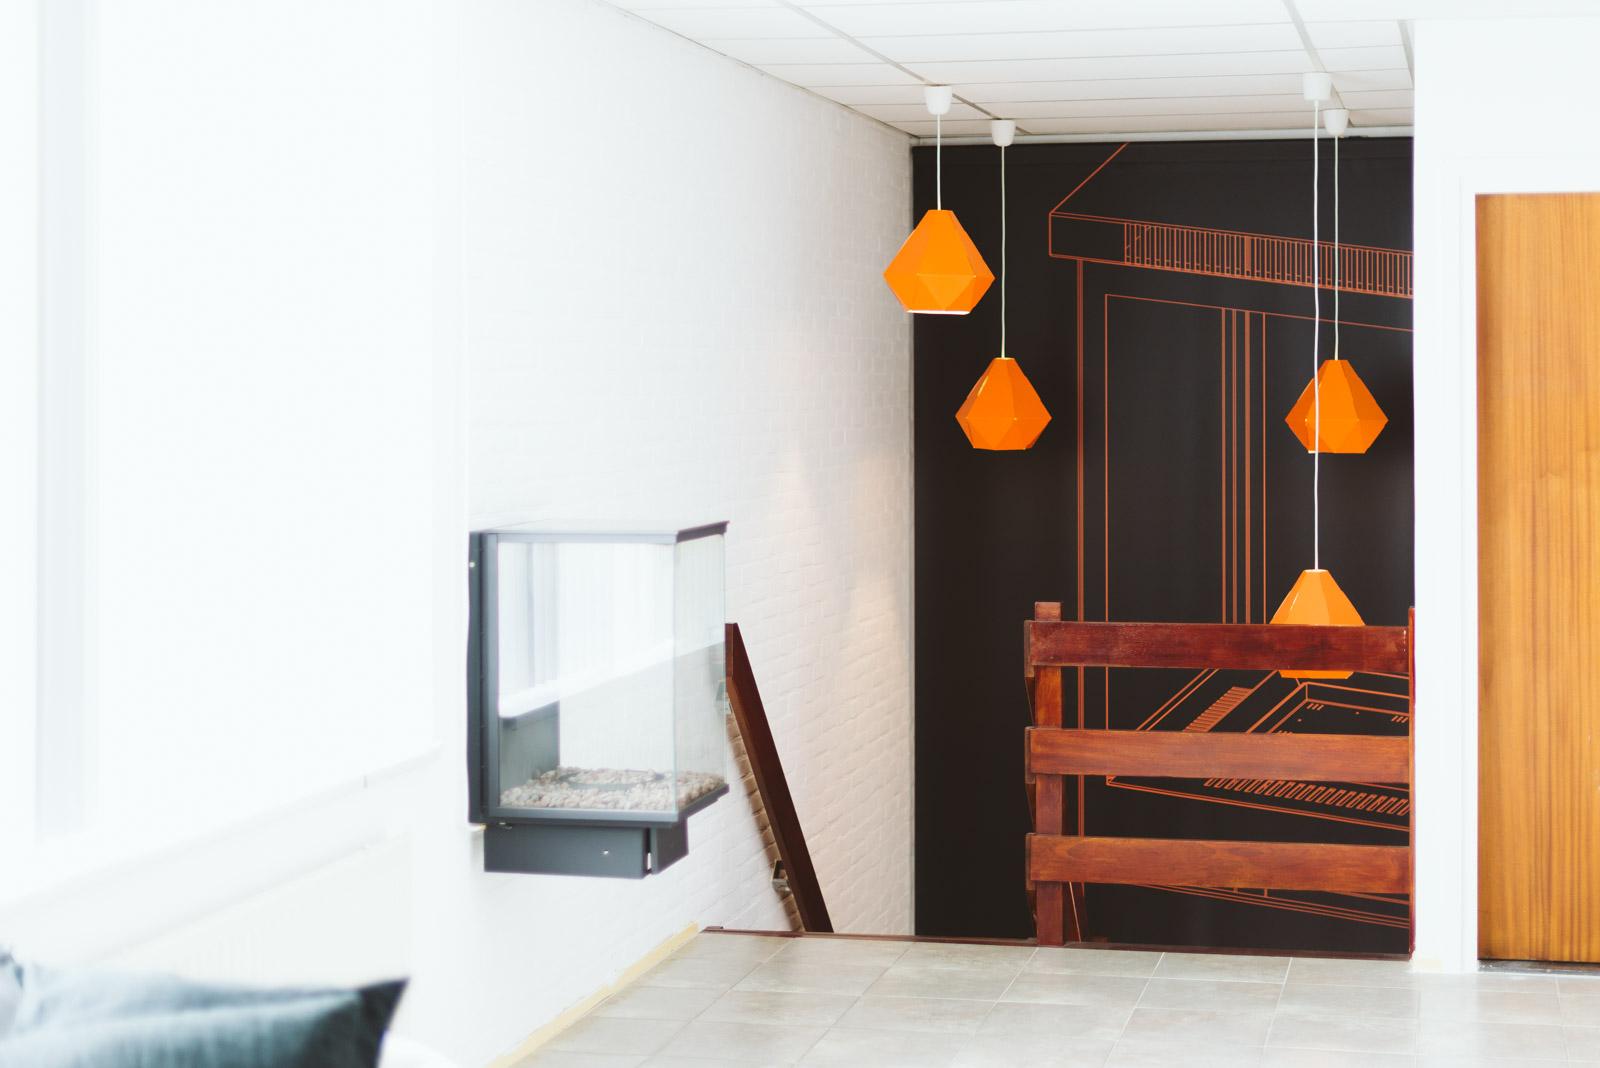 Over sunwood sunwood dutch design - Cortenstaal fabrikant ...